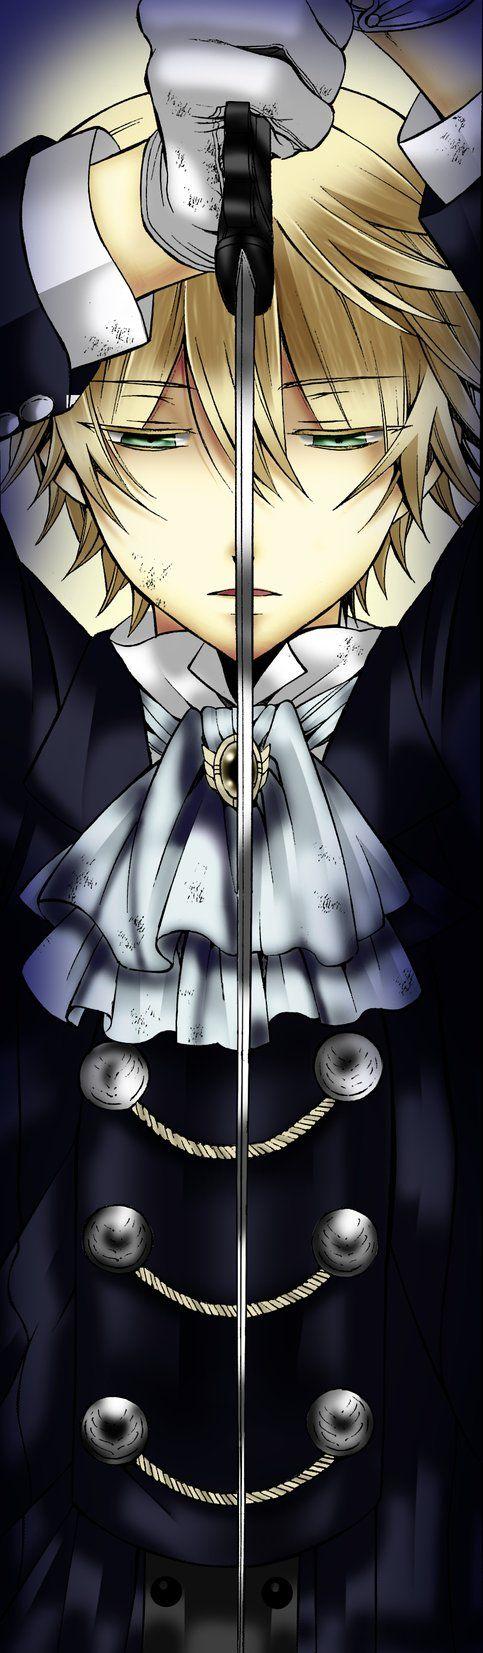 Pandora Hearts Oz Vessalius  Really love his expression >_< so cool that way!